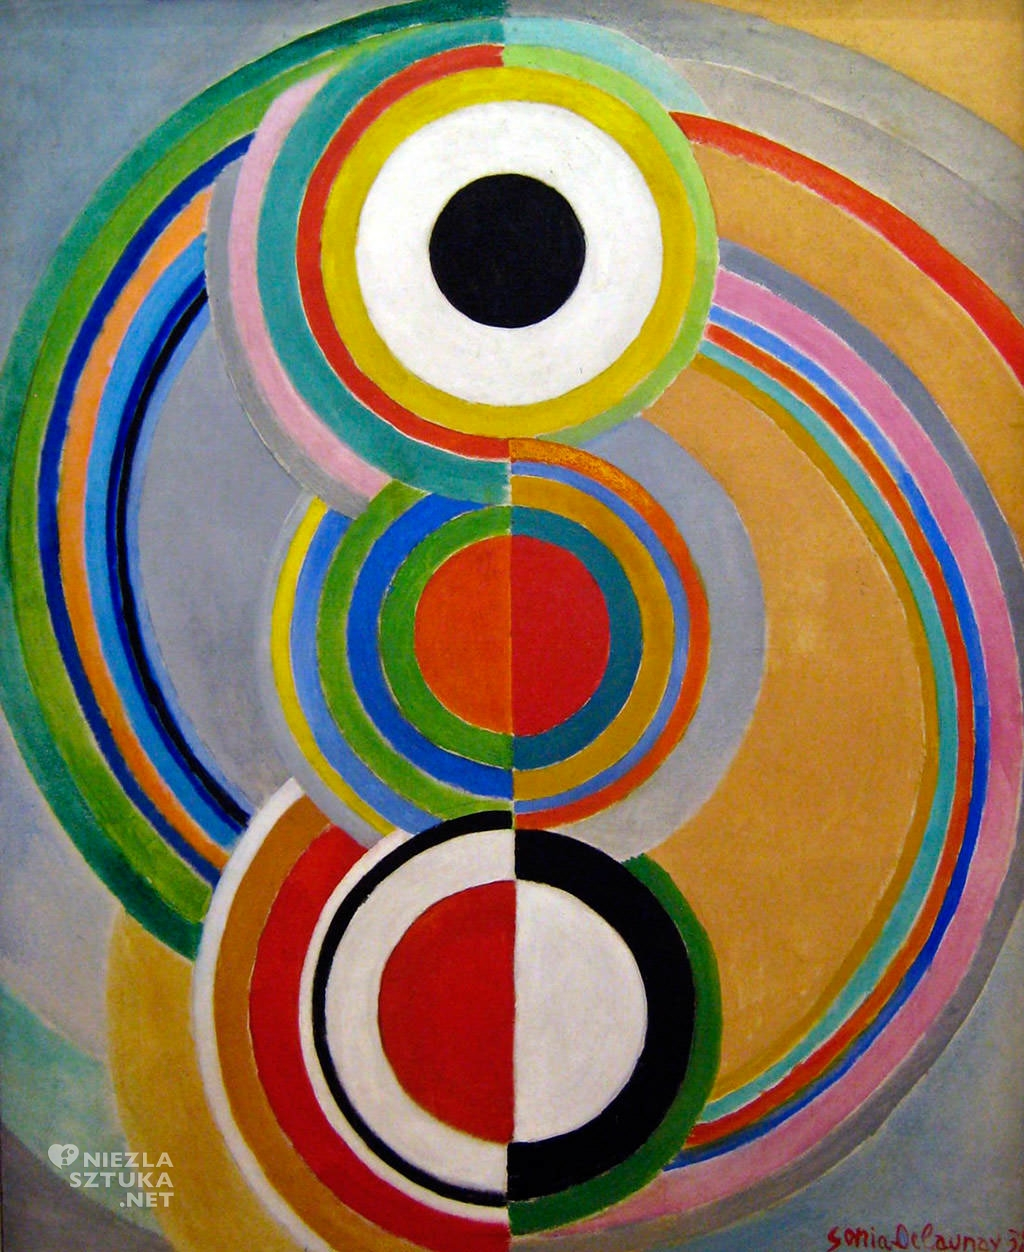 Sonia Delaunay Rytm, 1938, Niezła Sztuka